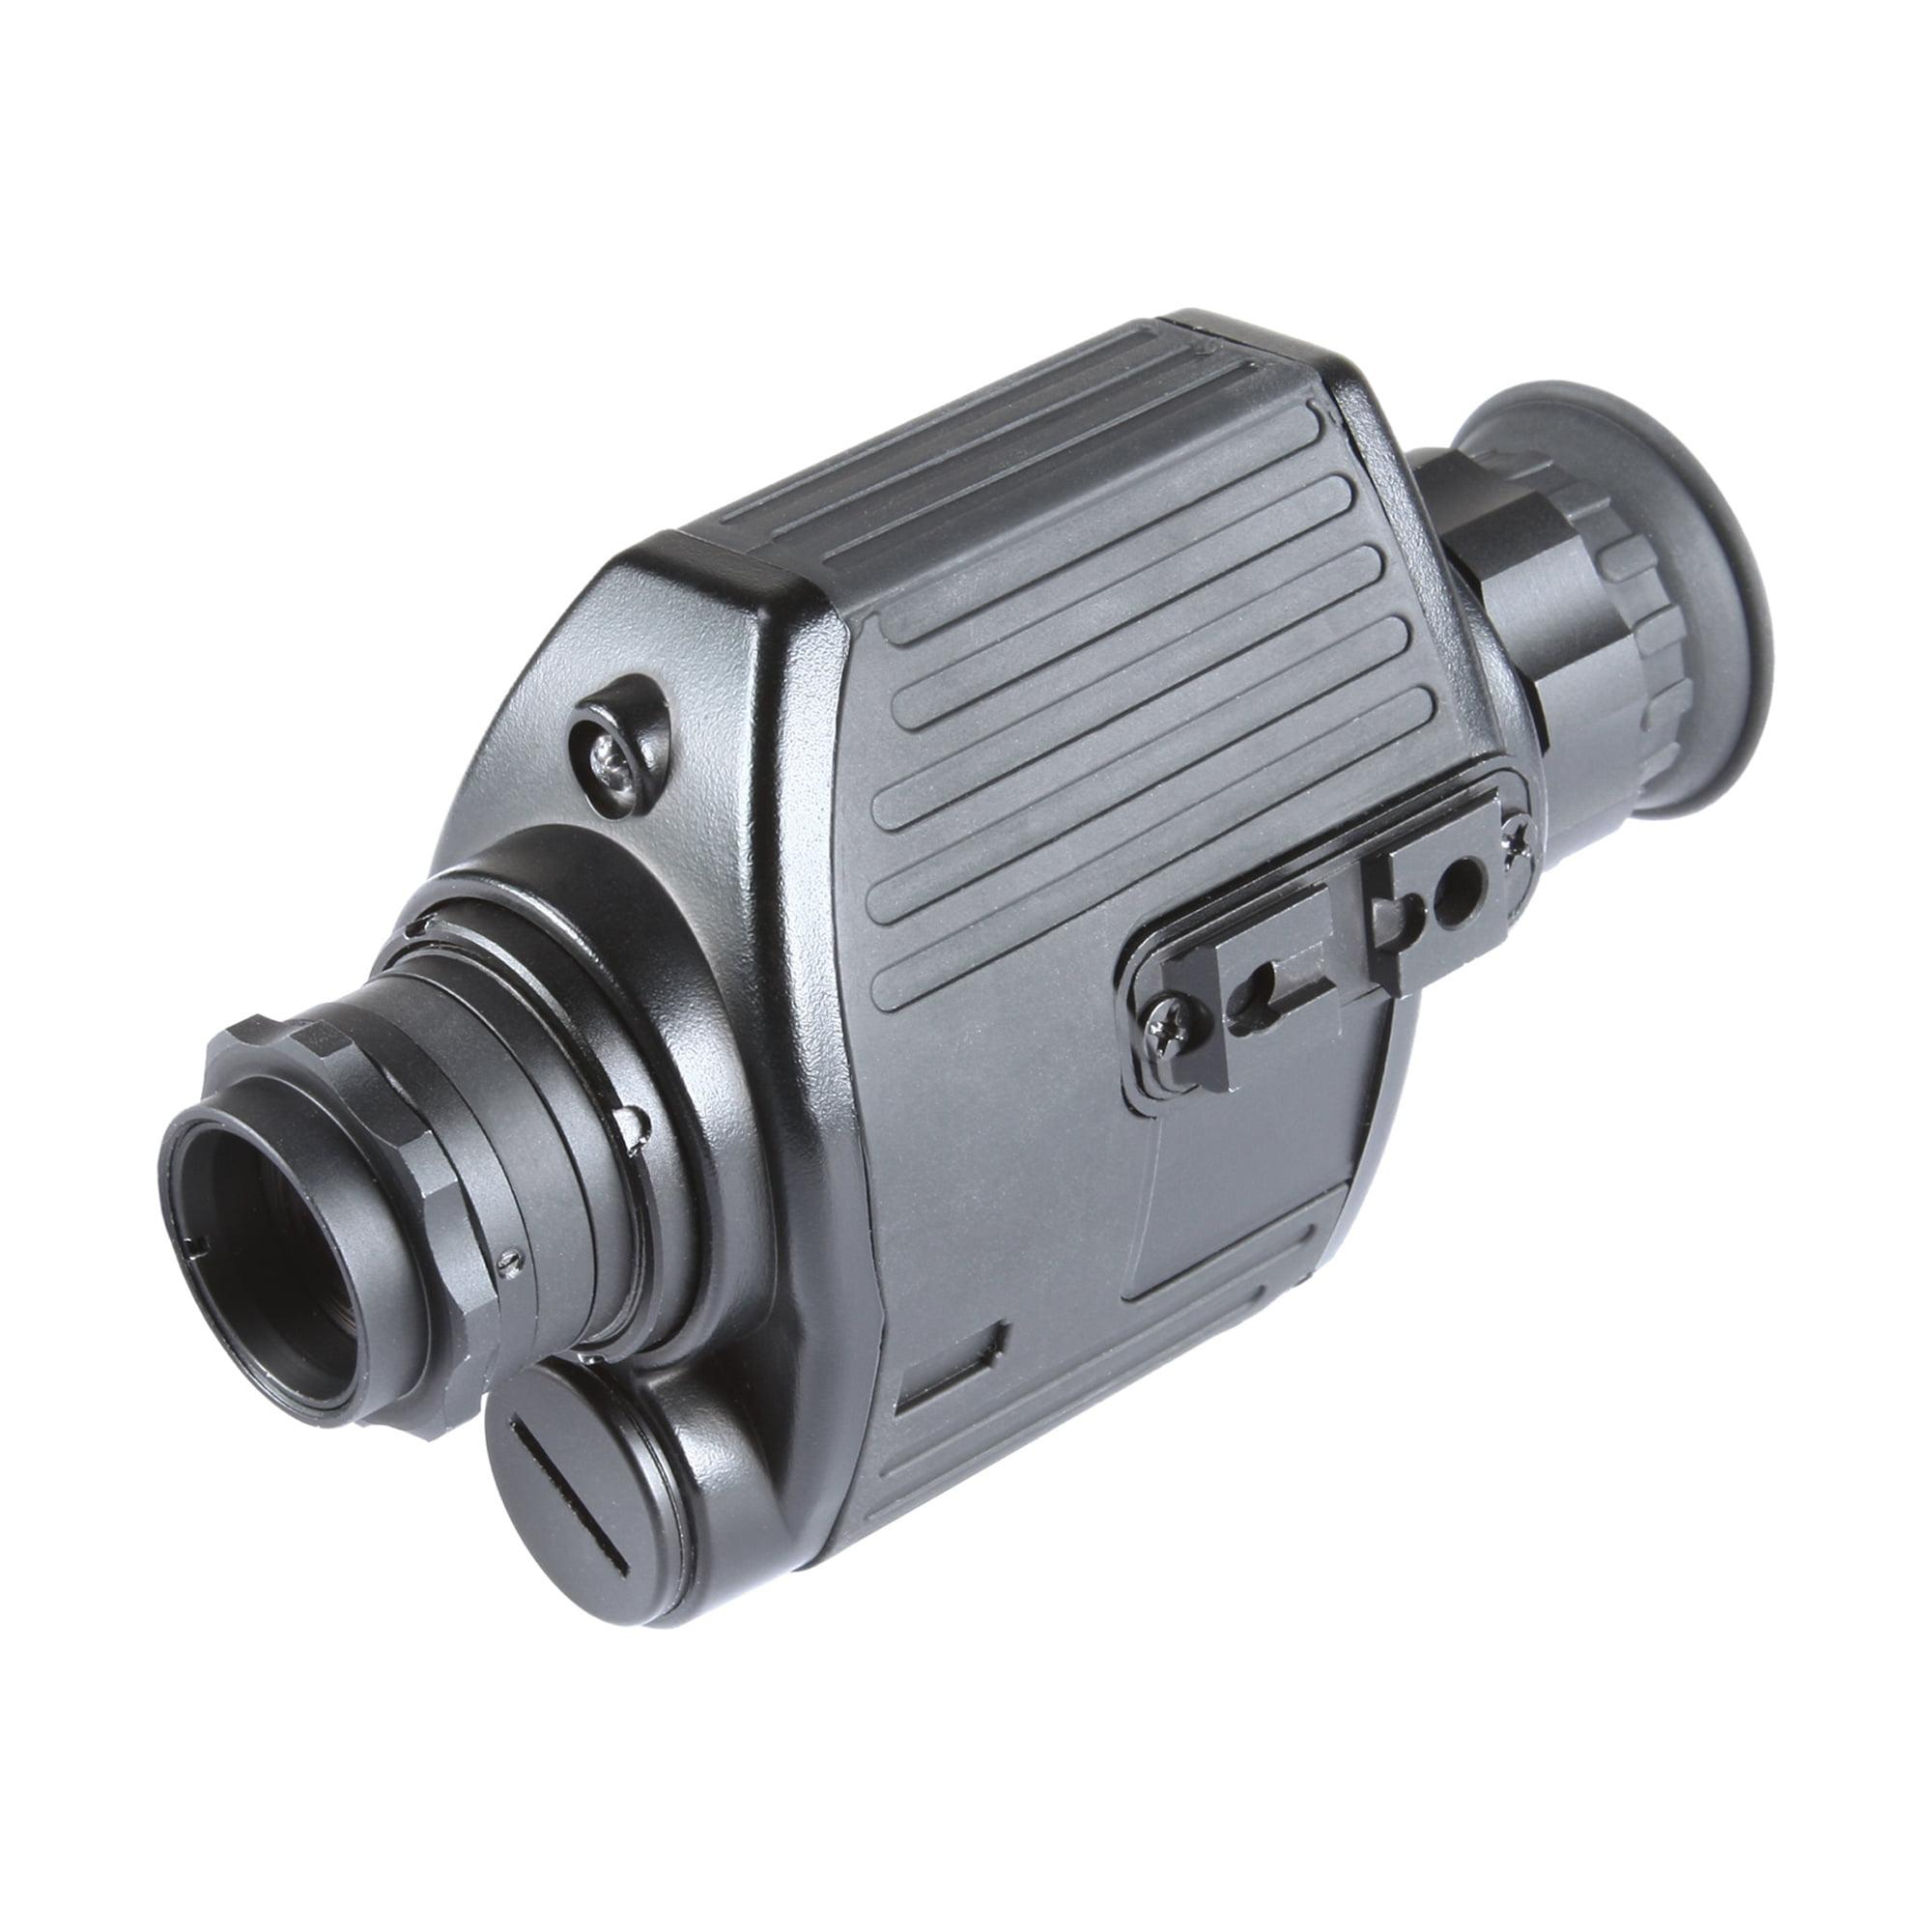 Armasight Vega-Mini Gen 1+ Night Vision Monocular NKGVEGA0M111I11 by FLIR